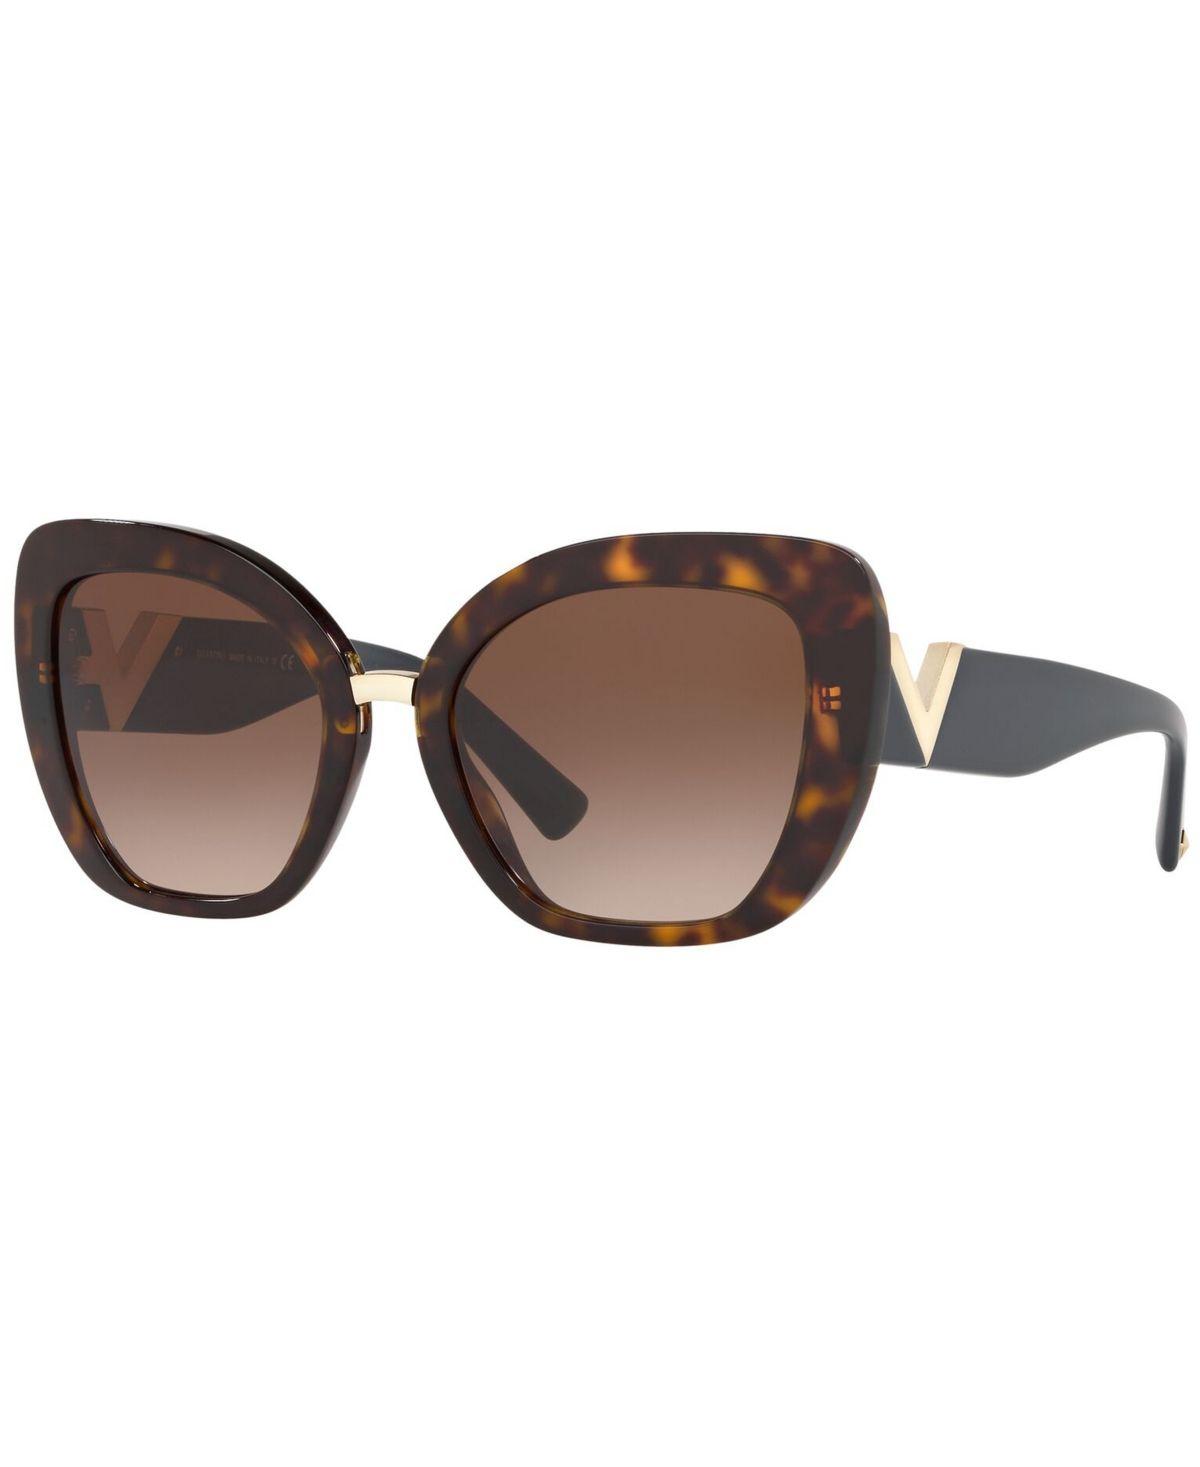 Sunglass Hut Fashion Advertisement: Valentino Sunglasses, VA4057 54 & Reviews